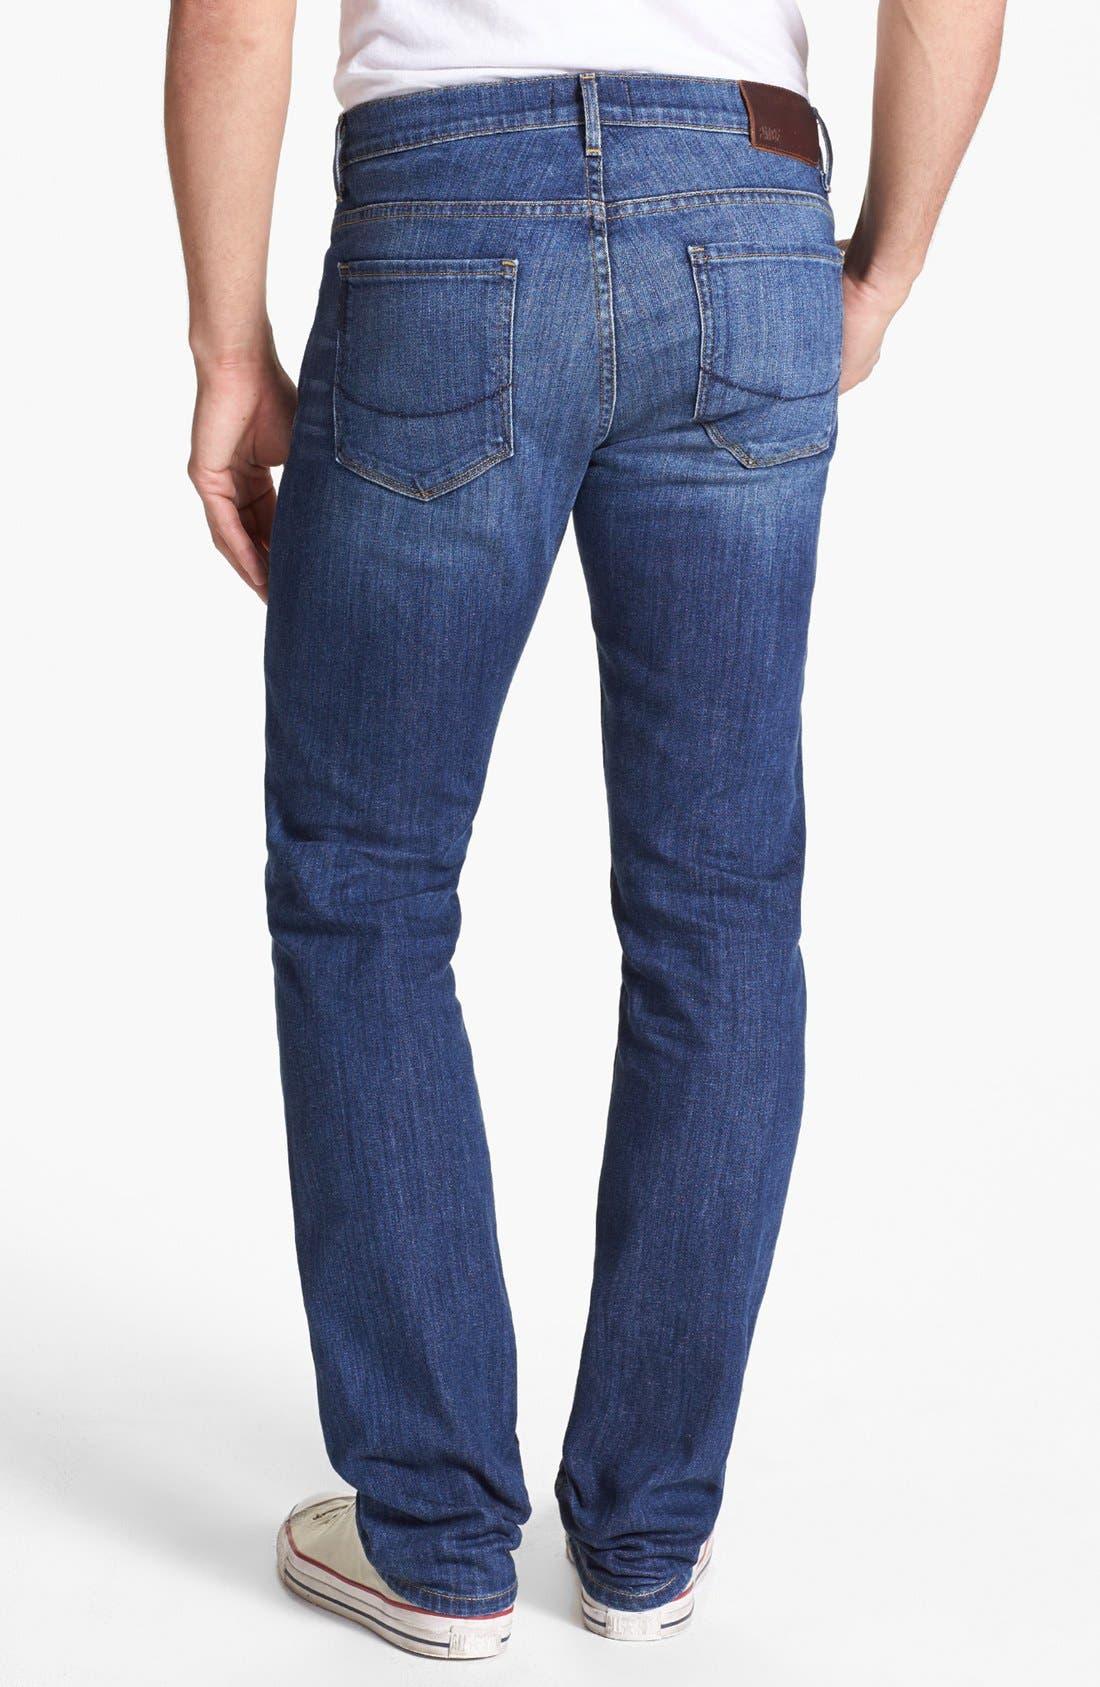 Main Image - PAIGE 'Normandie' Slim Fit Jeans (Current)